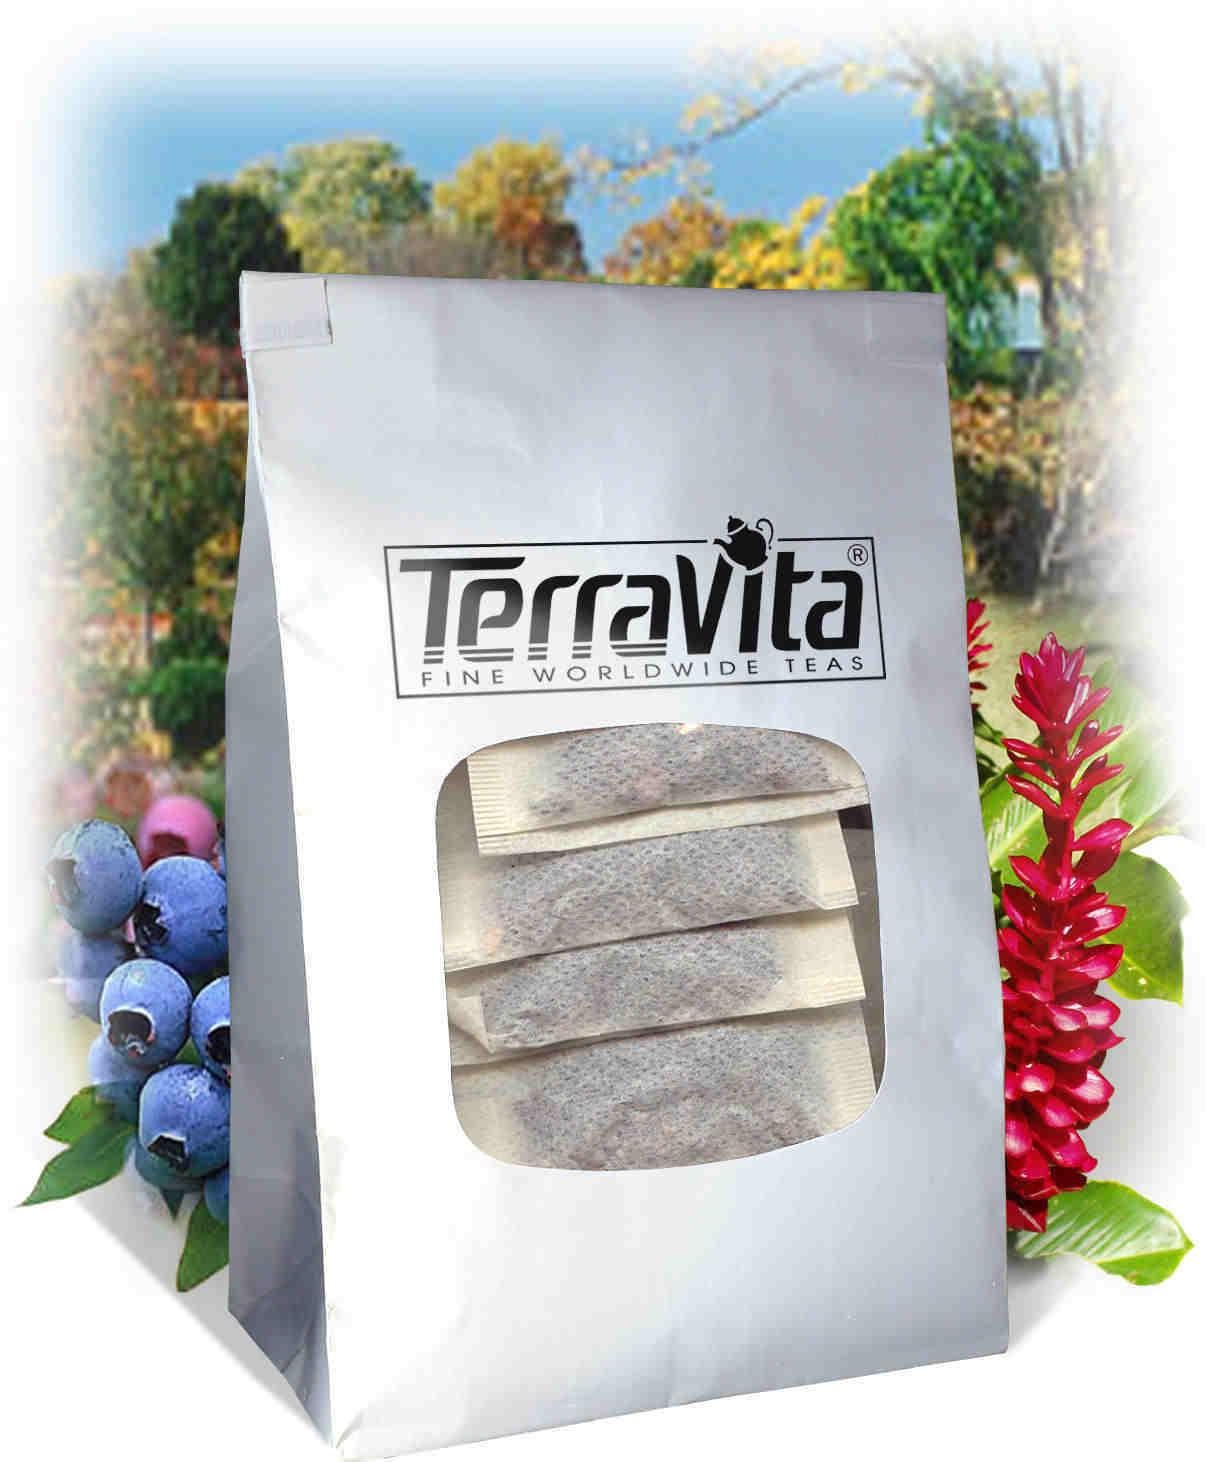 Lotus Leaf (Certified Organic) Tea